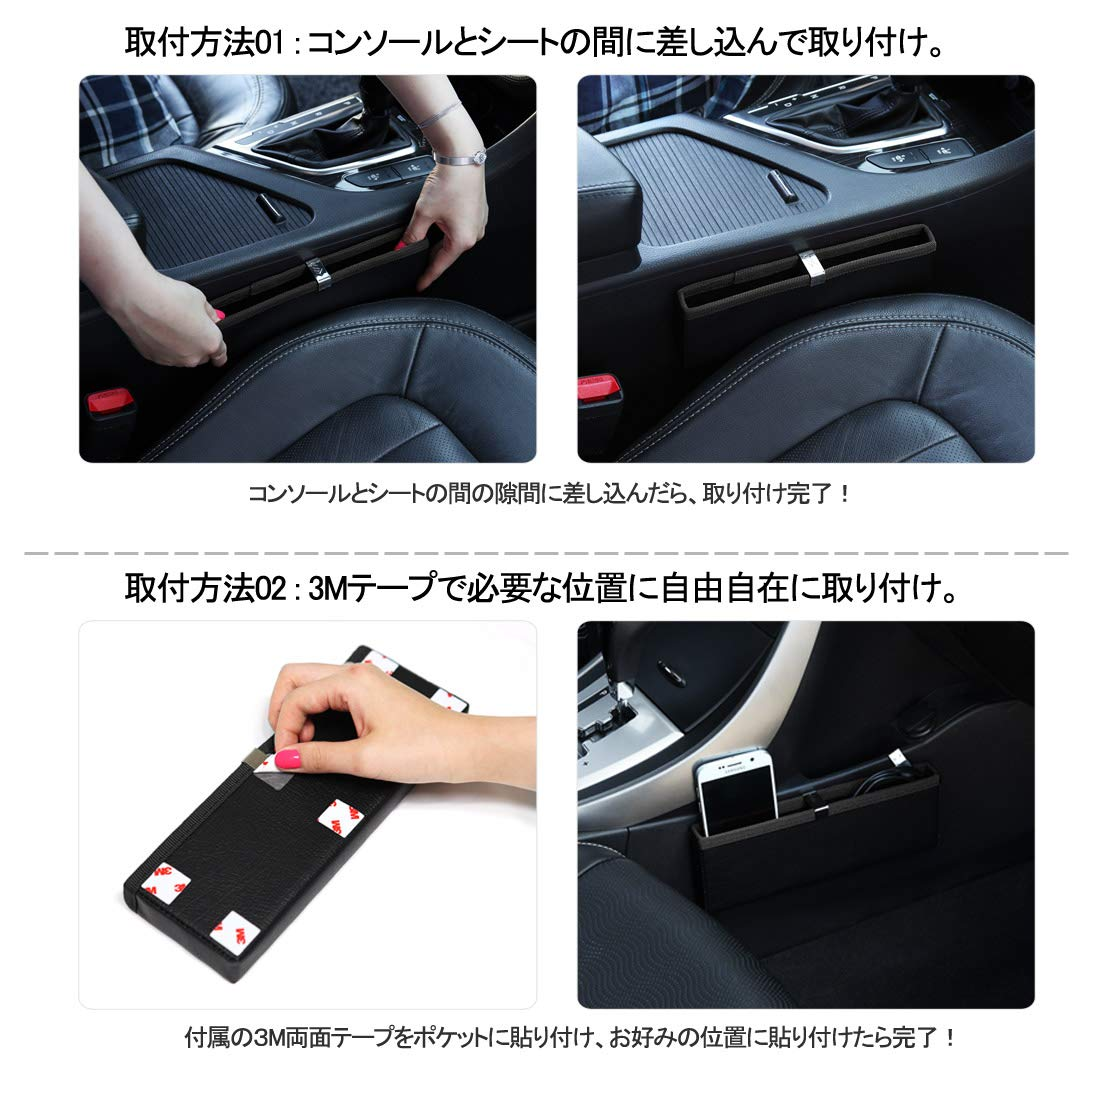 KMMOTORS Ultra Slim parte de bolsillo negro organizador de asiento lateral bolsillos de coche